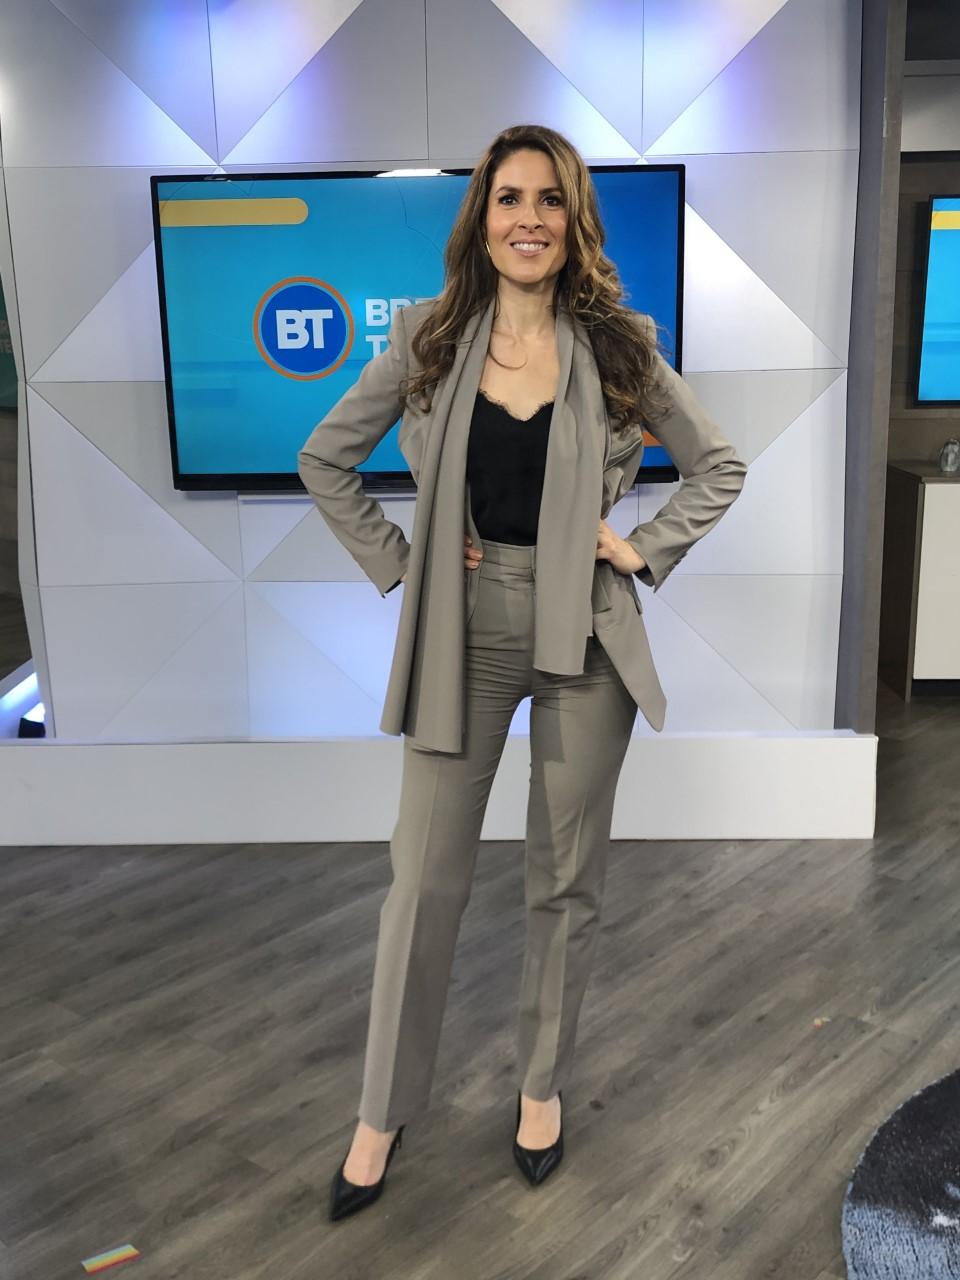 Dina wearing a grey blazer and matching suit pants - 2